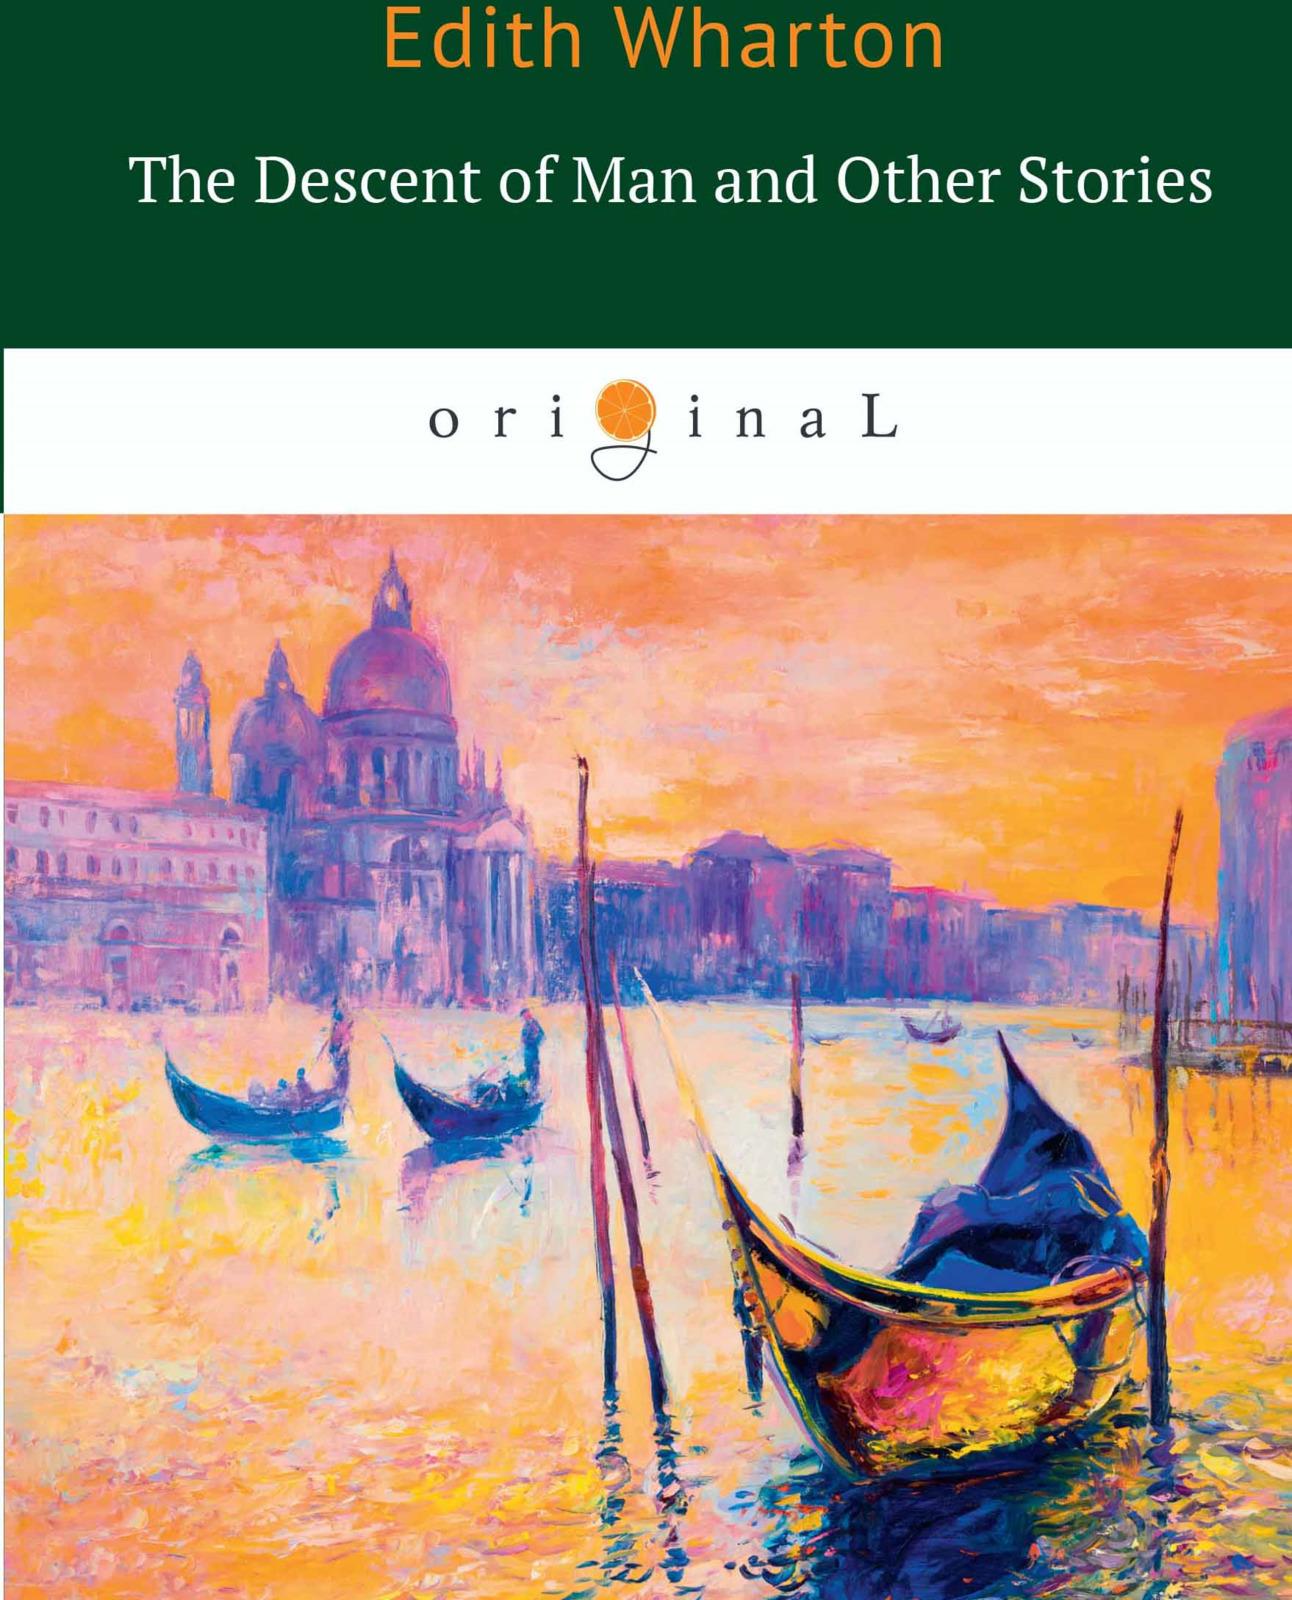 E. Wharton The Descent of Man and Other Stories e wharton sanctuary and the long run